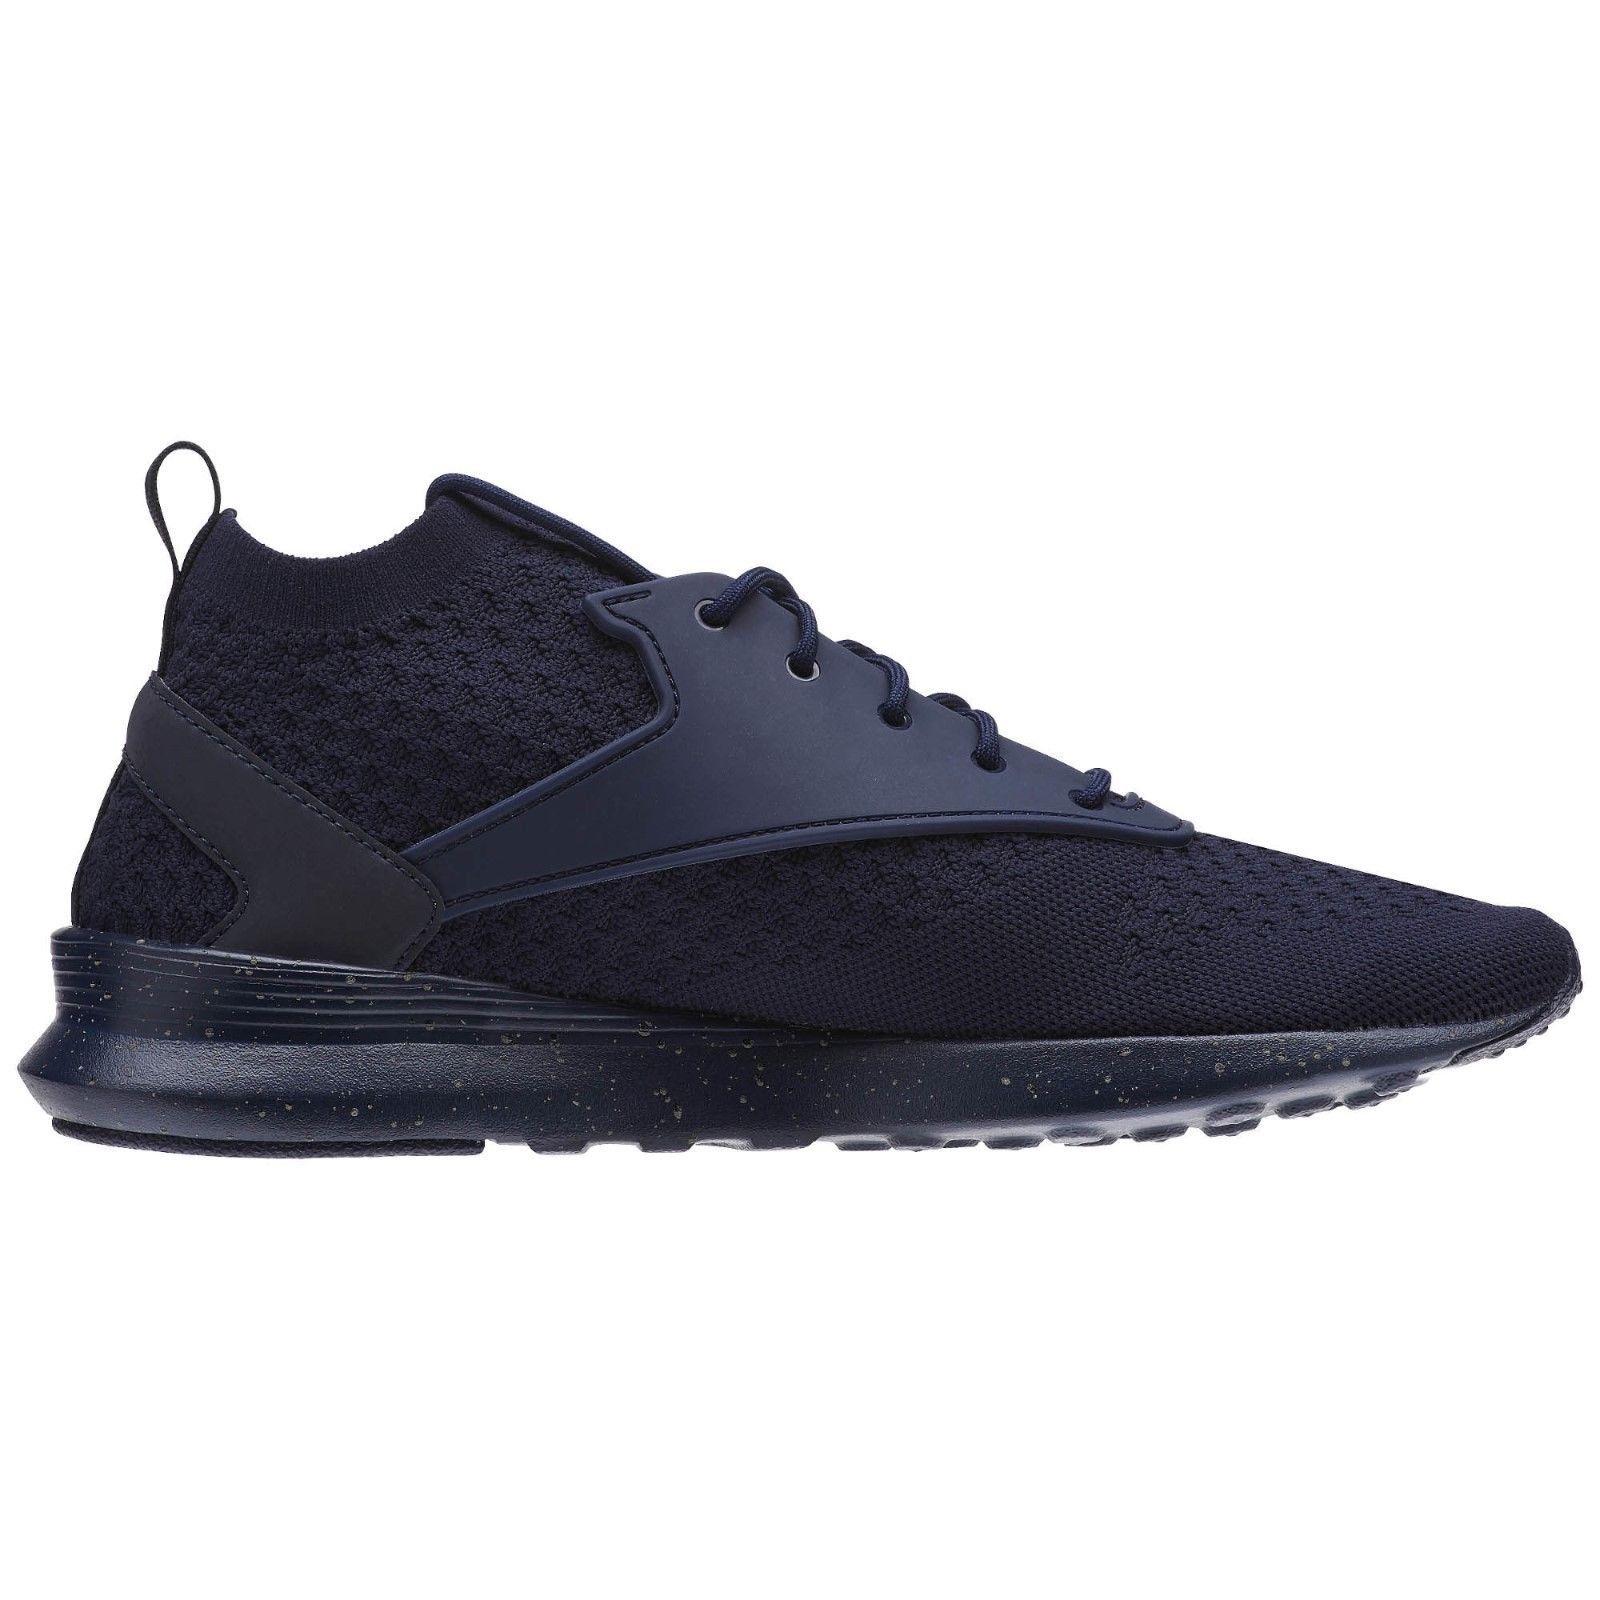 Reebok Classics Men s ZOKU RUNNER Ultraknit IS Sneakers Size 7 to 12 us  BS9115 a76ba57e1